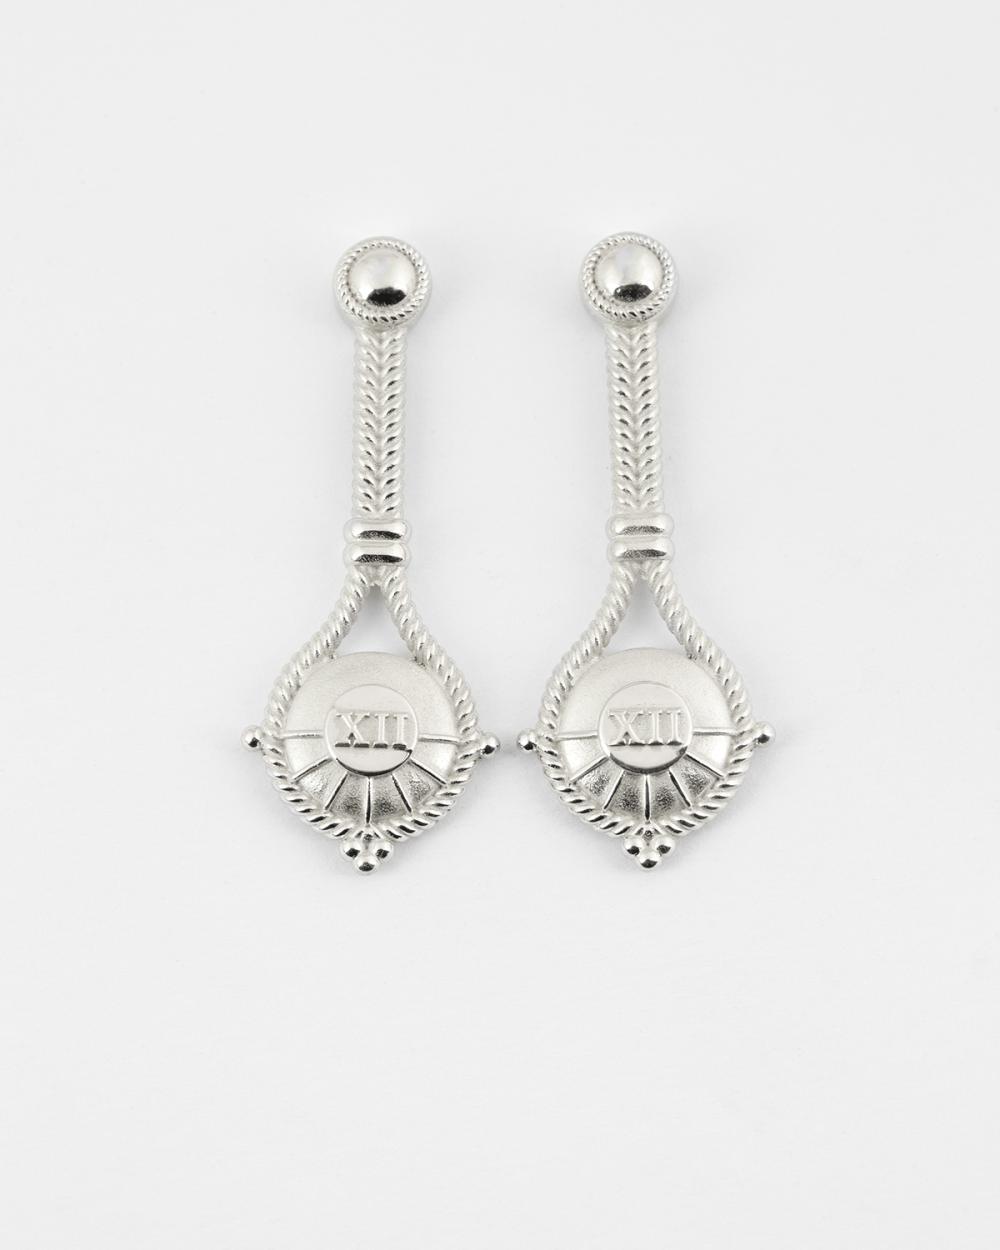 silver the hanged man pair earrings